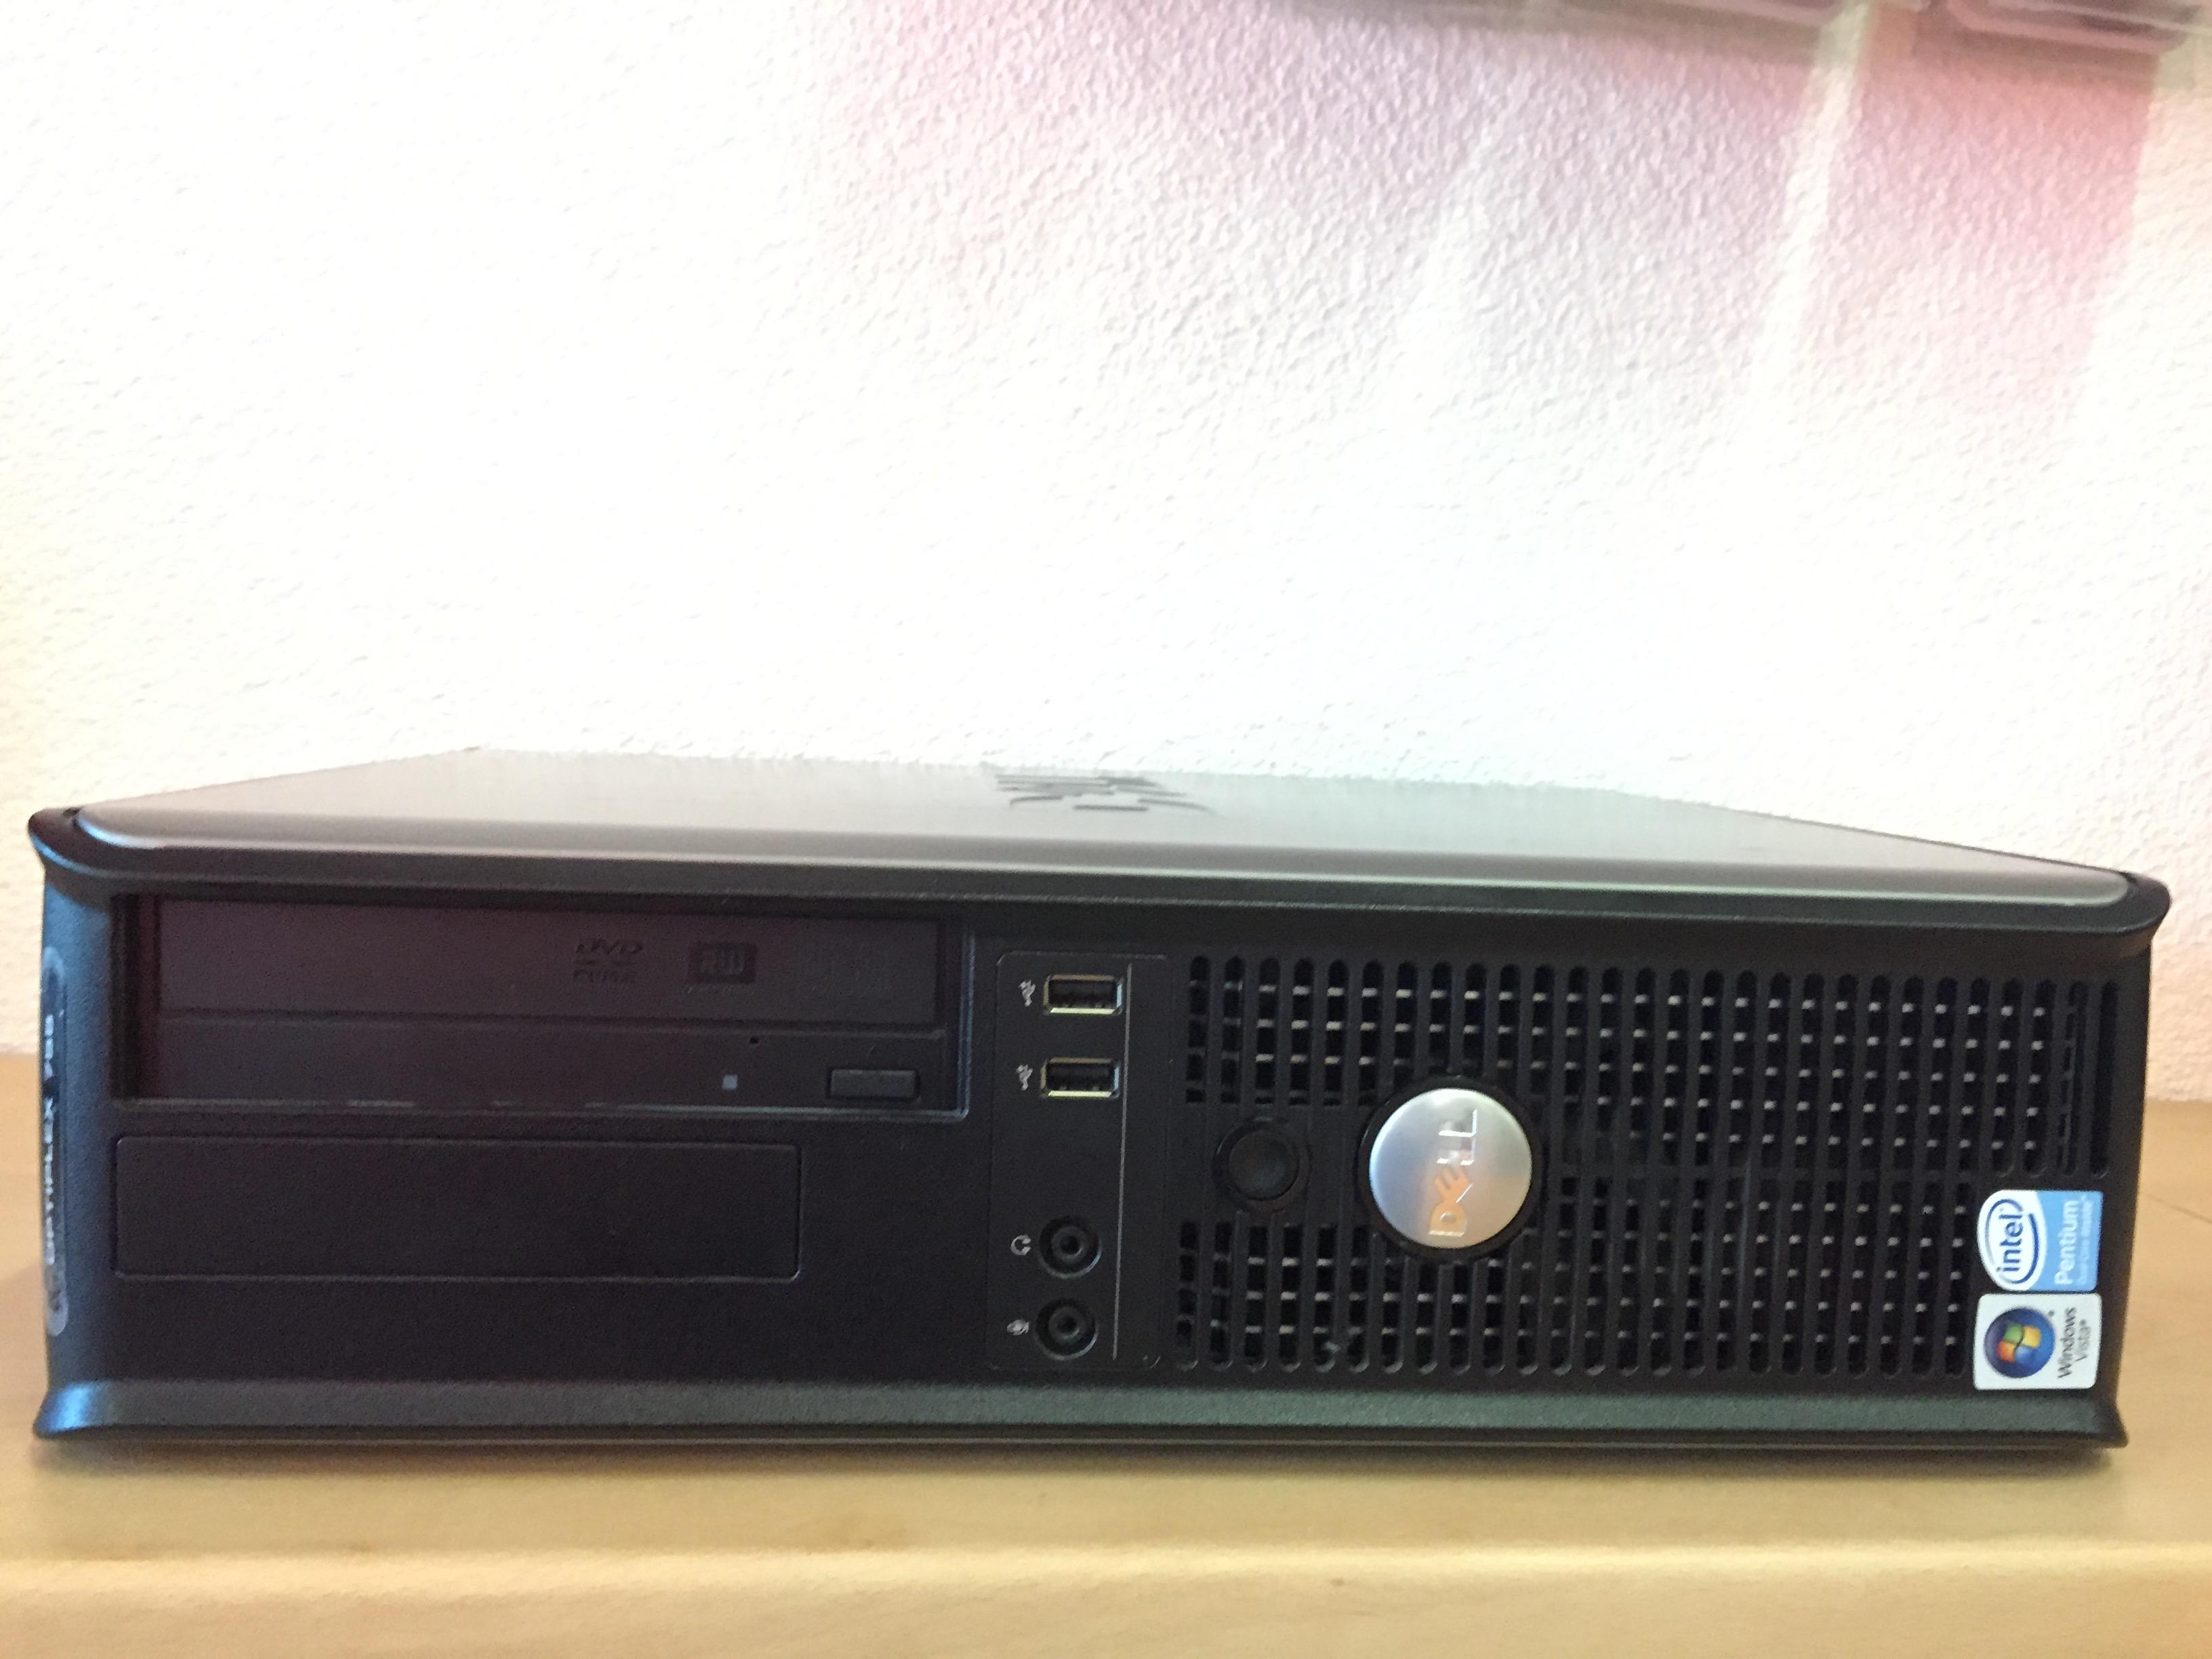 Isorm also 251167756548 moreover Dell 8400 Desktop And Dell 19 Lcd together with Dell Optiplex 755 C2d E8400 3 0 Ghz 4gb Ddrii 320gb Hdd Dvd Rw Pc Desktop 61059527 together with Dell Xps 630i Intel Core 2 Quad Q6850 3 Ghz 4 Gb 1 Tb 1xdvd Cdrw  bo 1xdvdrw Ms Windows Vista Ultimate Dell Refurbished. on dell 8400 upgrades